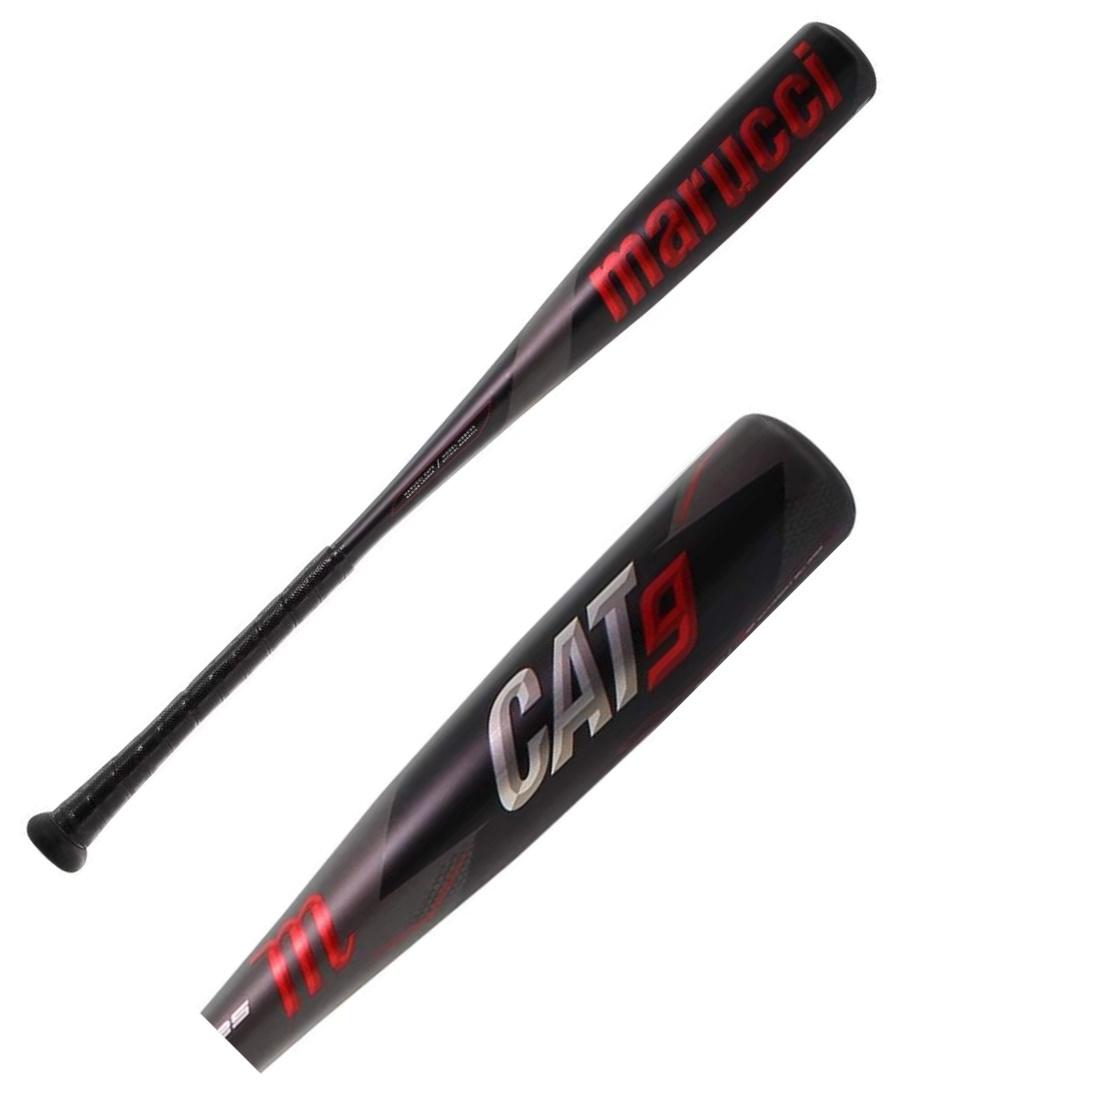 marucci-cat-9-8-usssa-baseball-bat-29-in-21-oz MSBC98-2921 Marucci  <p>Utilizing a three-stage thermal treatment process our new AZR alloy offers